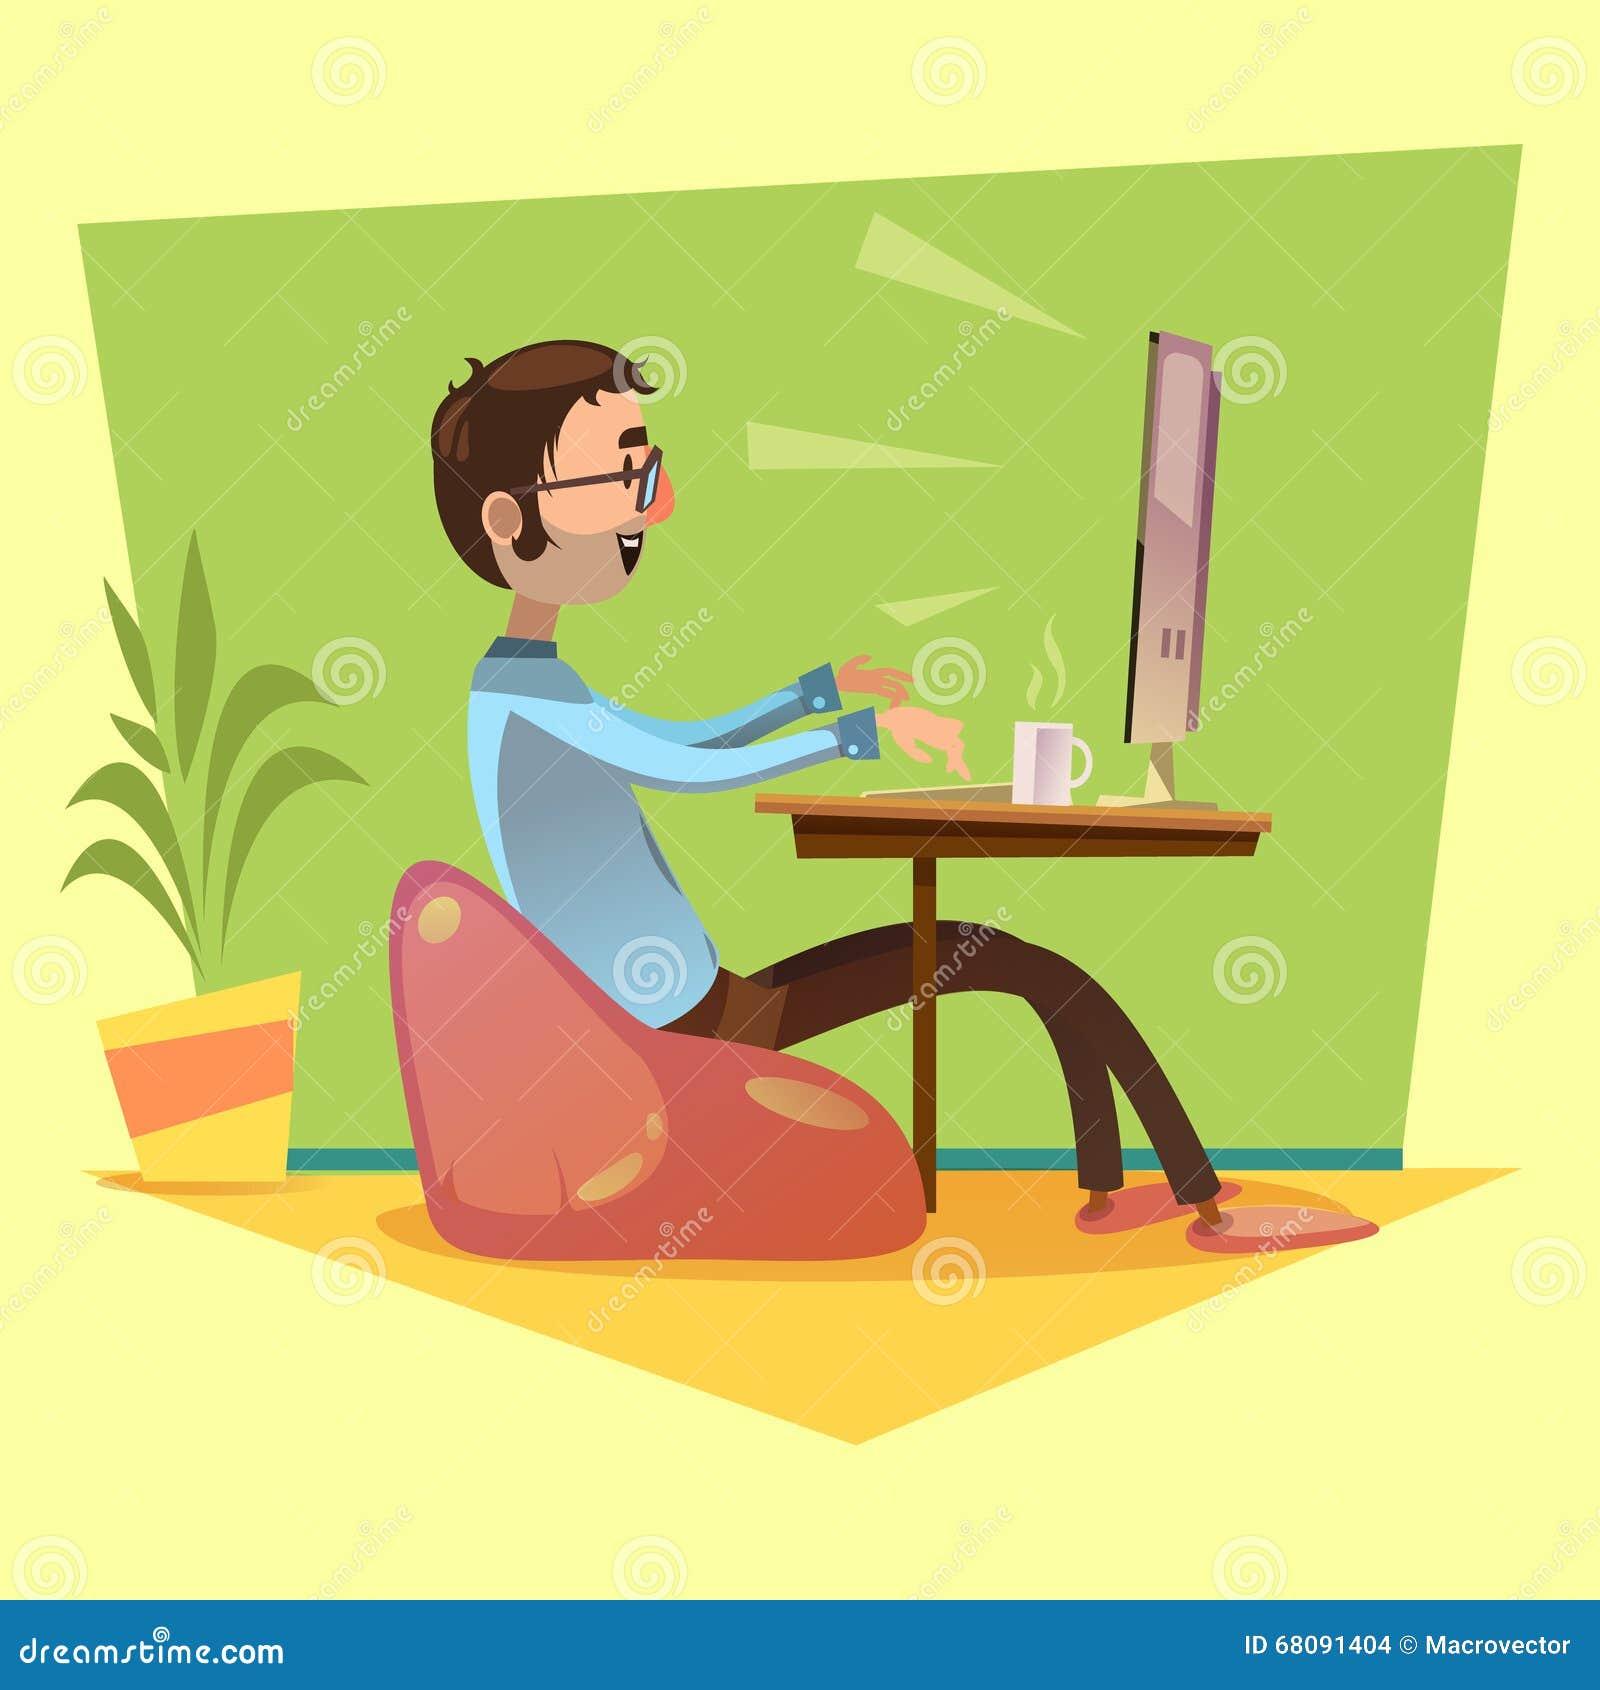 cartoon programmer working behind the computer stock image 77862319. Black Bedroom Furniture Sets. Home Design Ideas